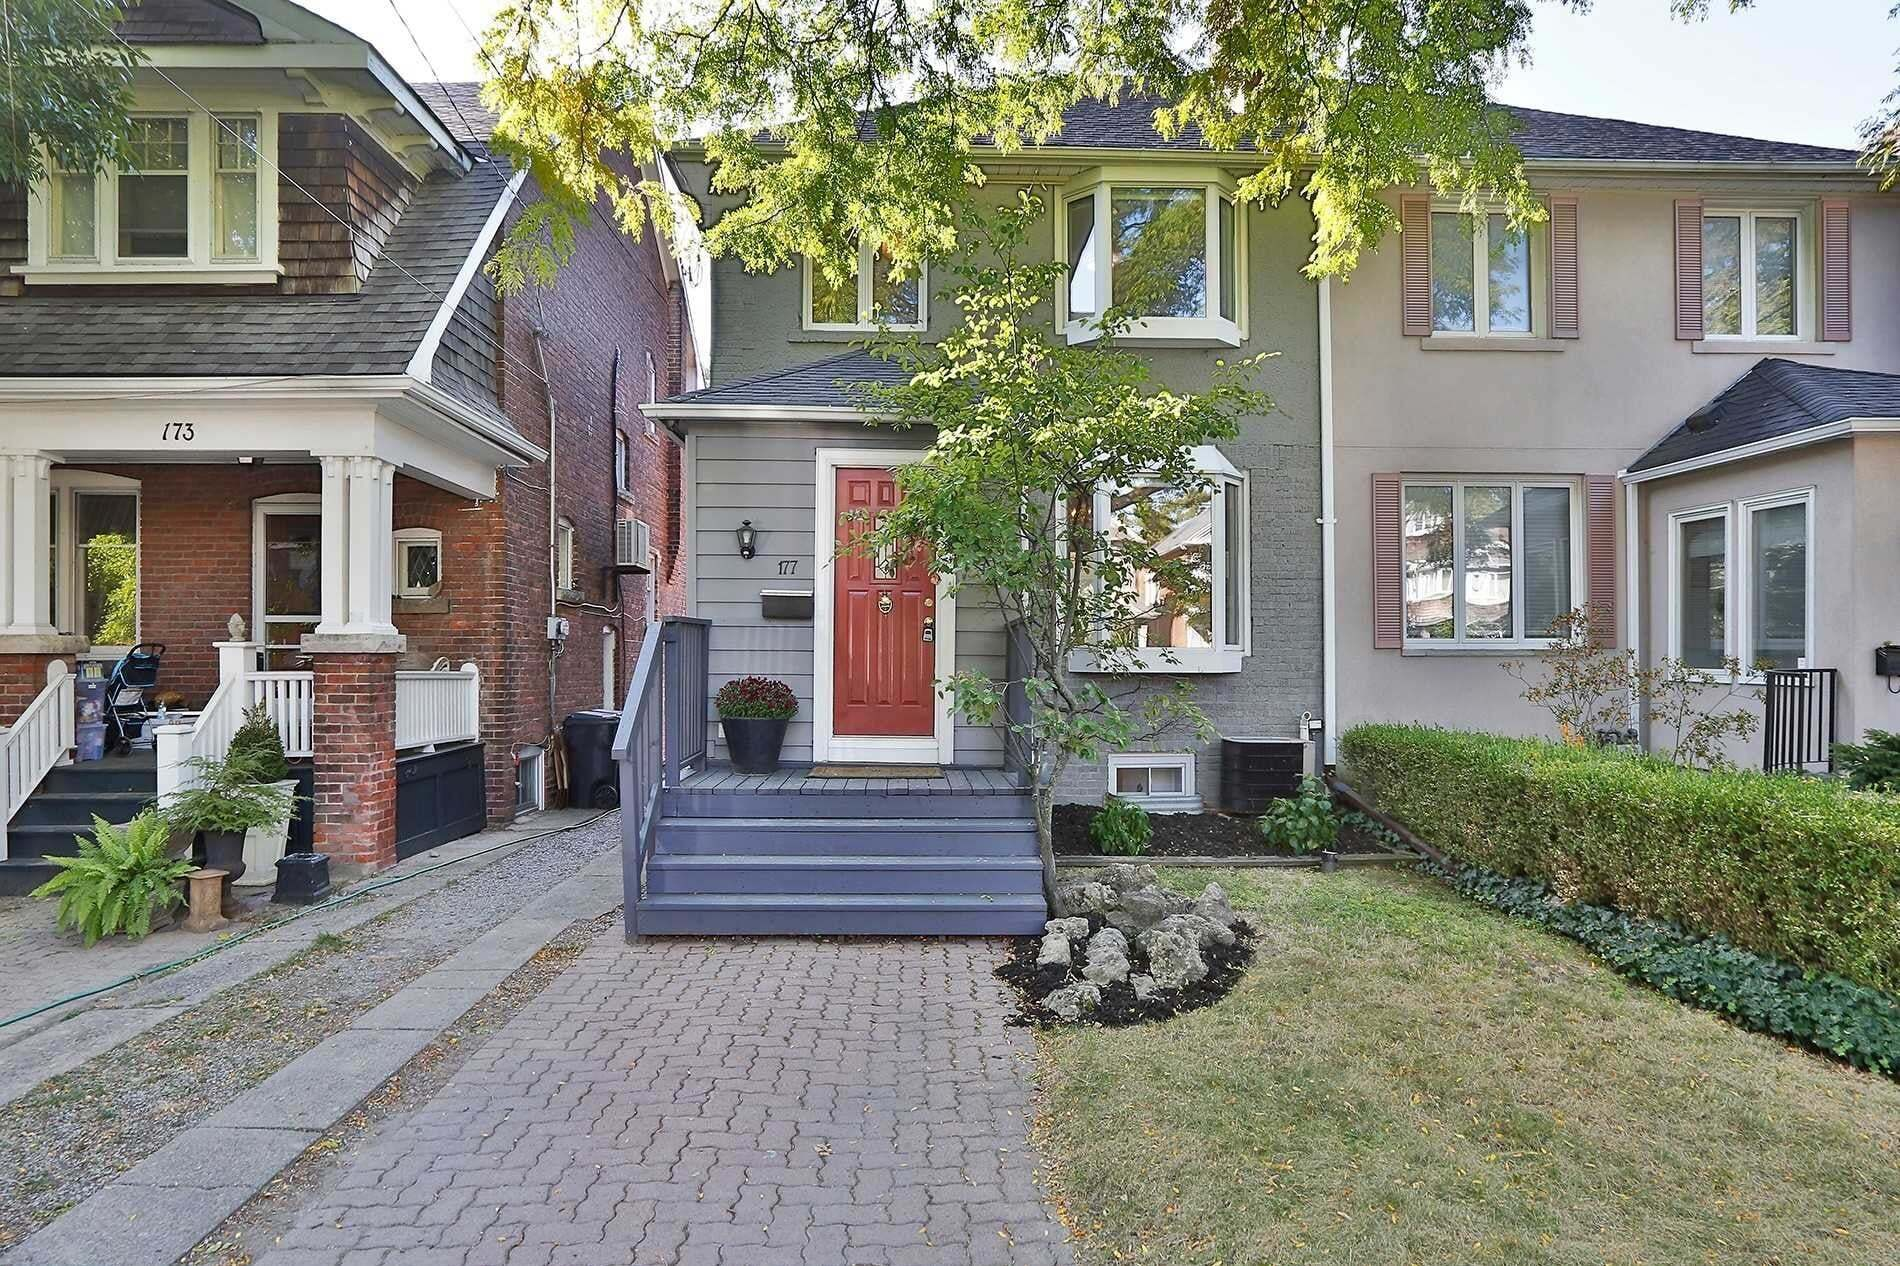 Townhouse for sale at 177 Albertus Ave Toronto Ontario - MLS: C4915504